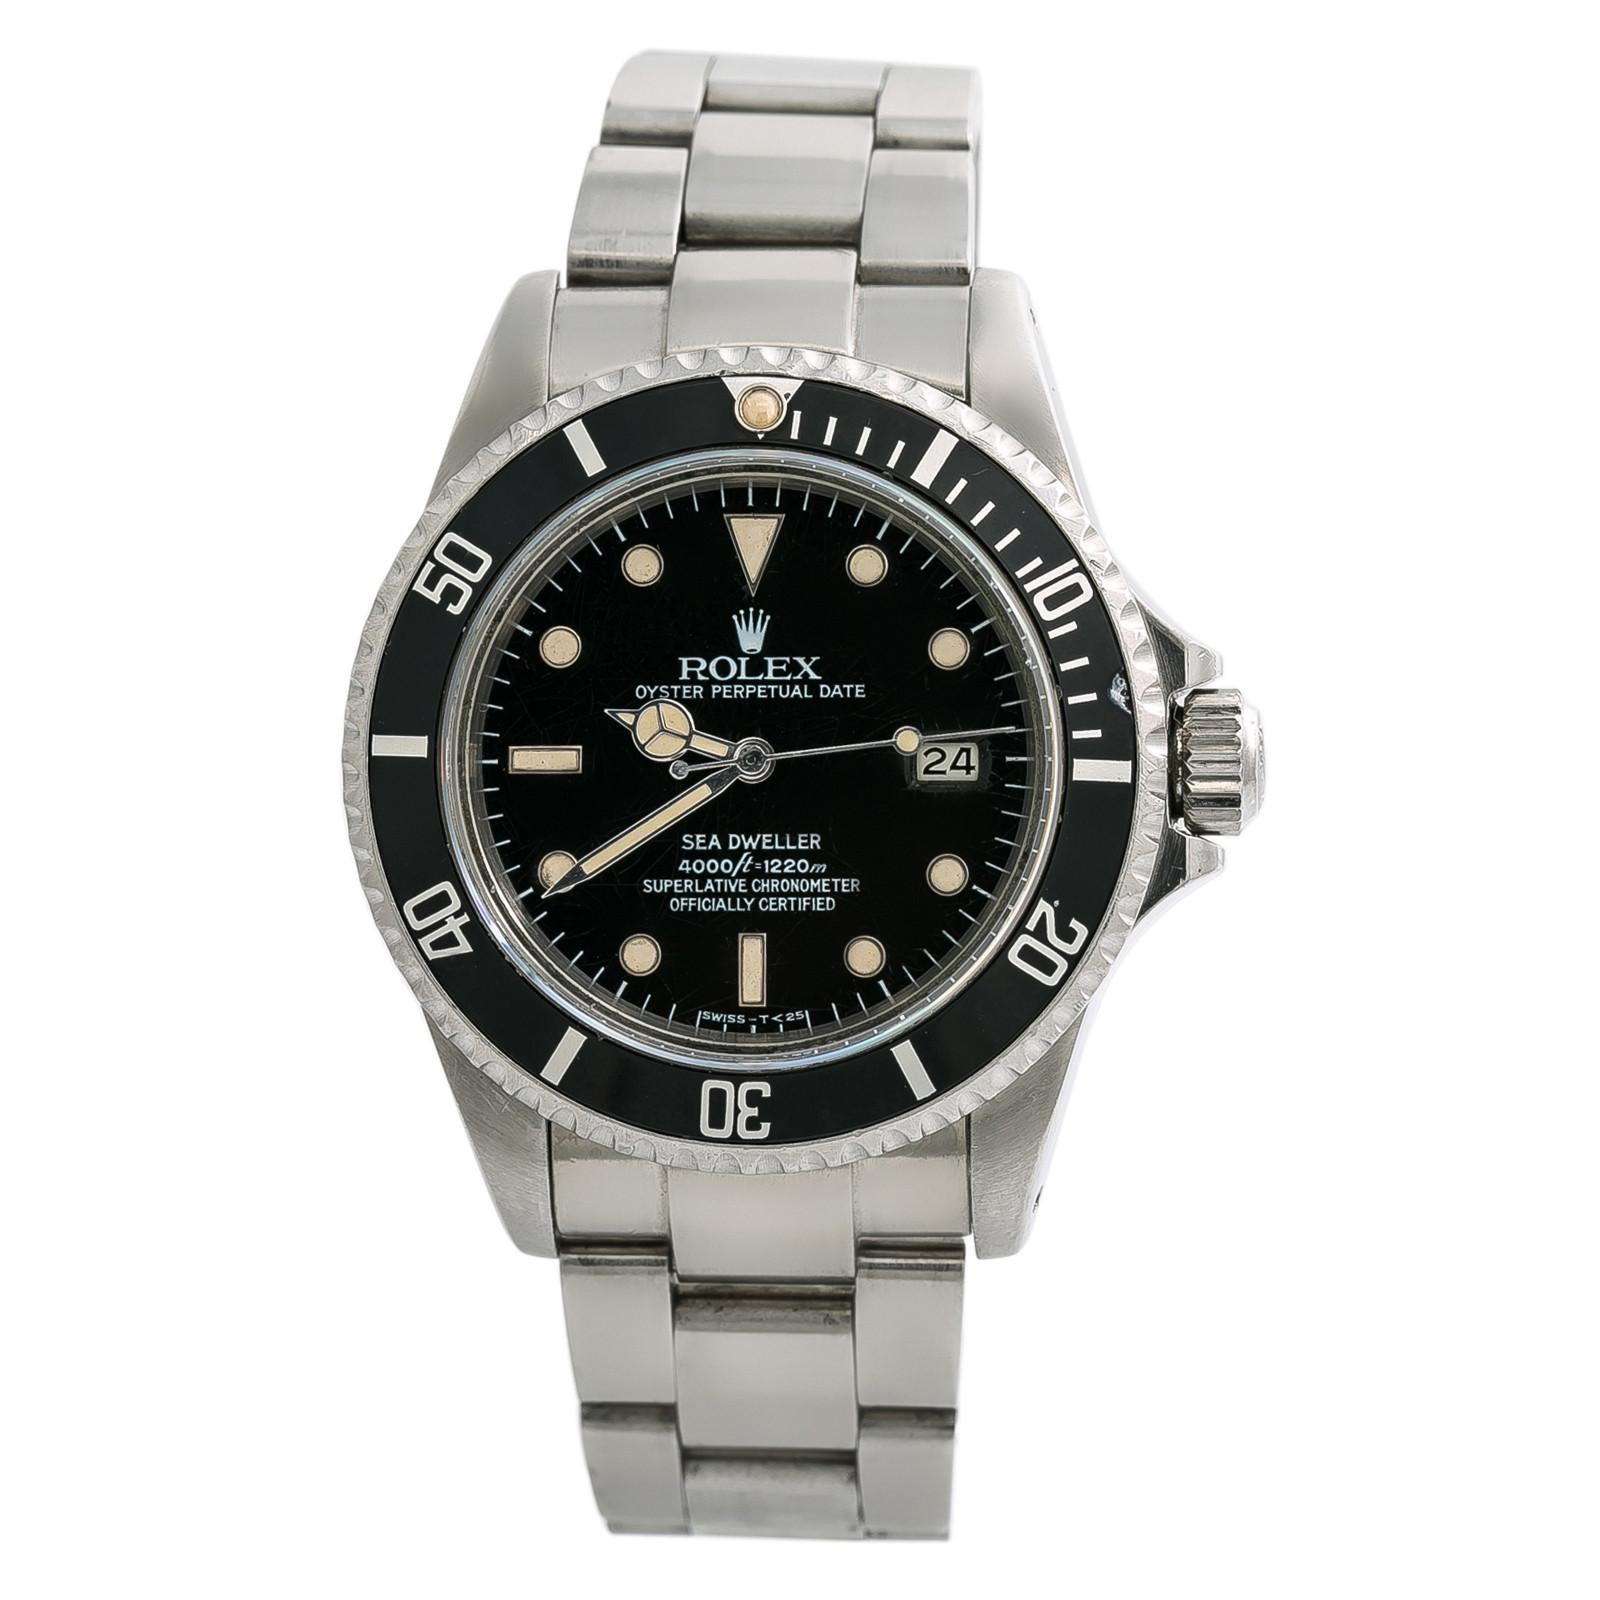 Rolex Sea-Dweller 16660, Black Dial Certified Authentic